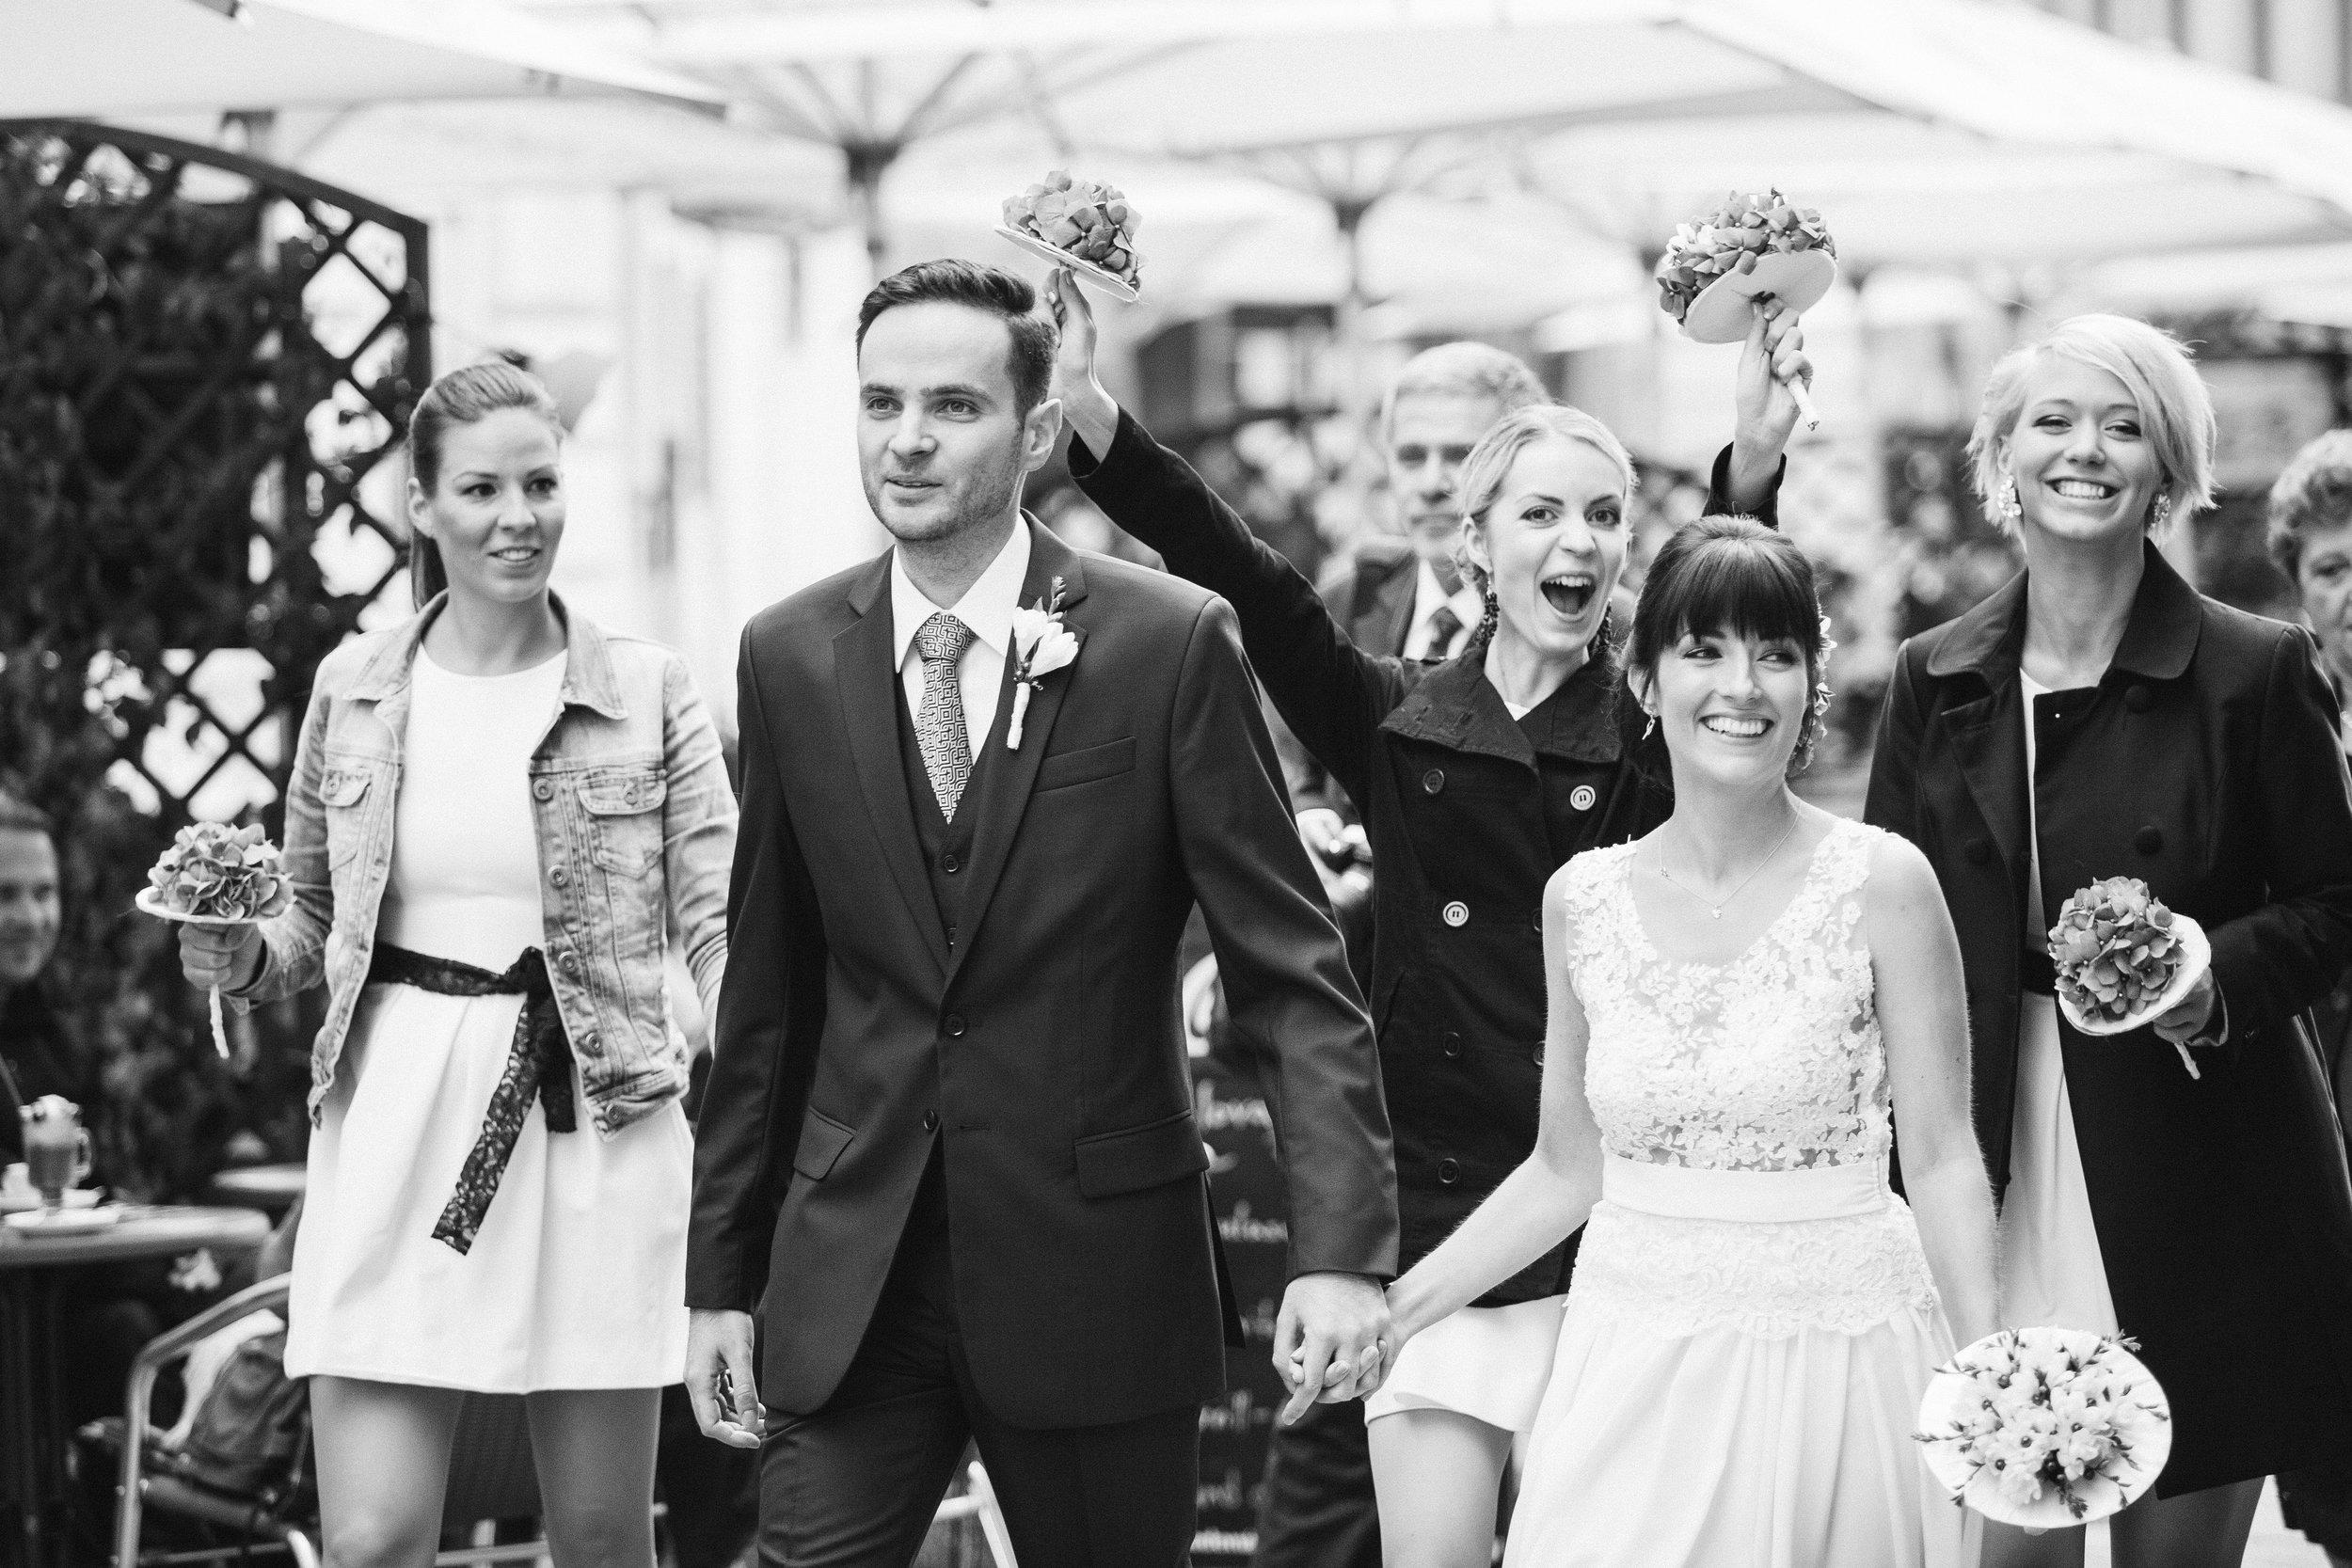 destination-wedding-photographer-bratislava-slovakia-europe-bw-documentary-happy-guest-2.jpg